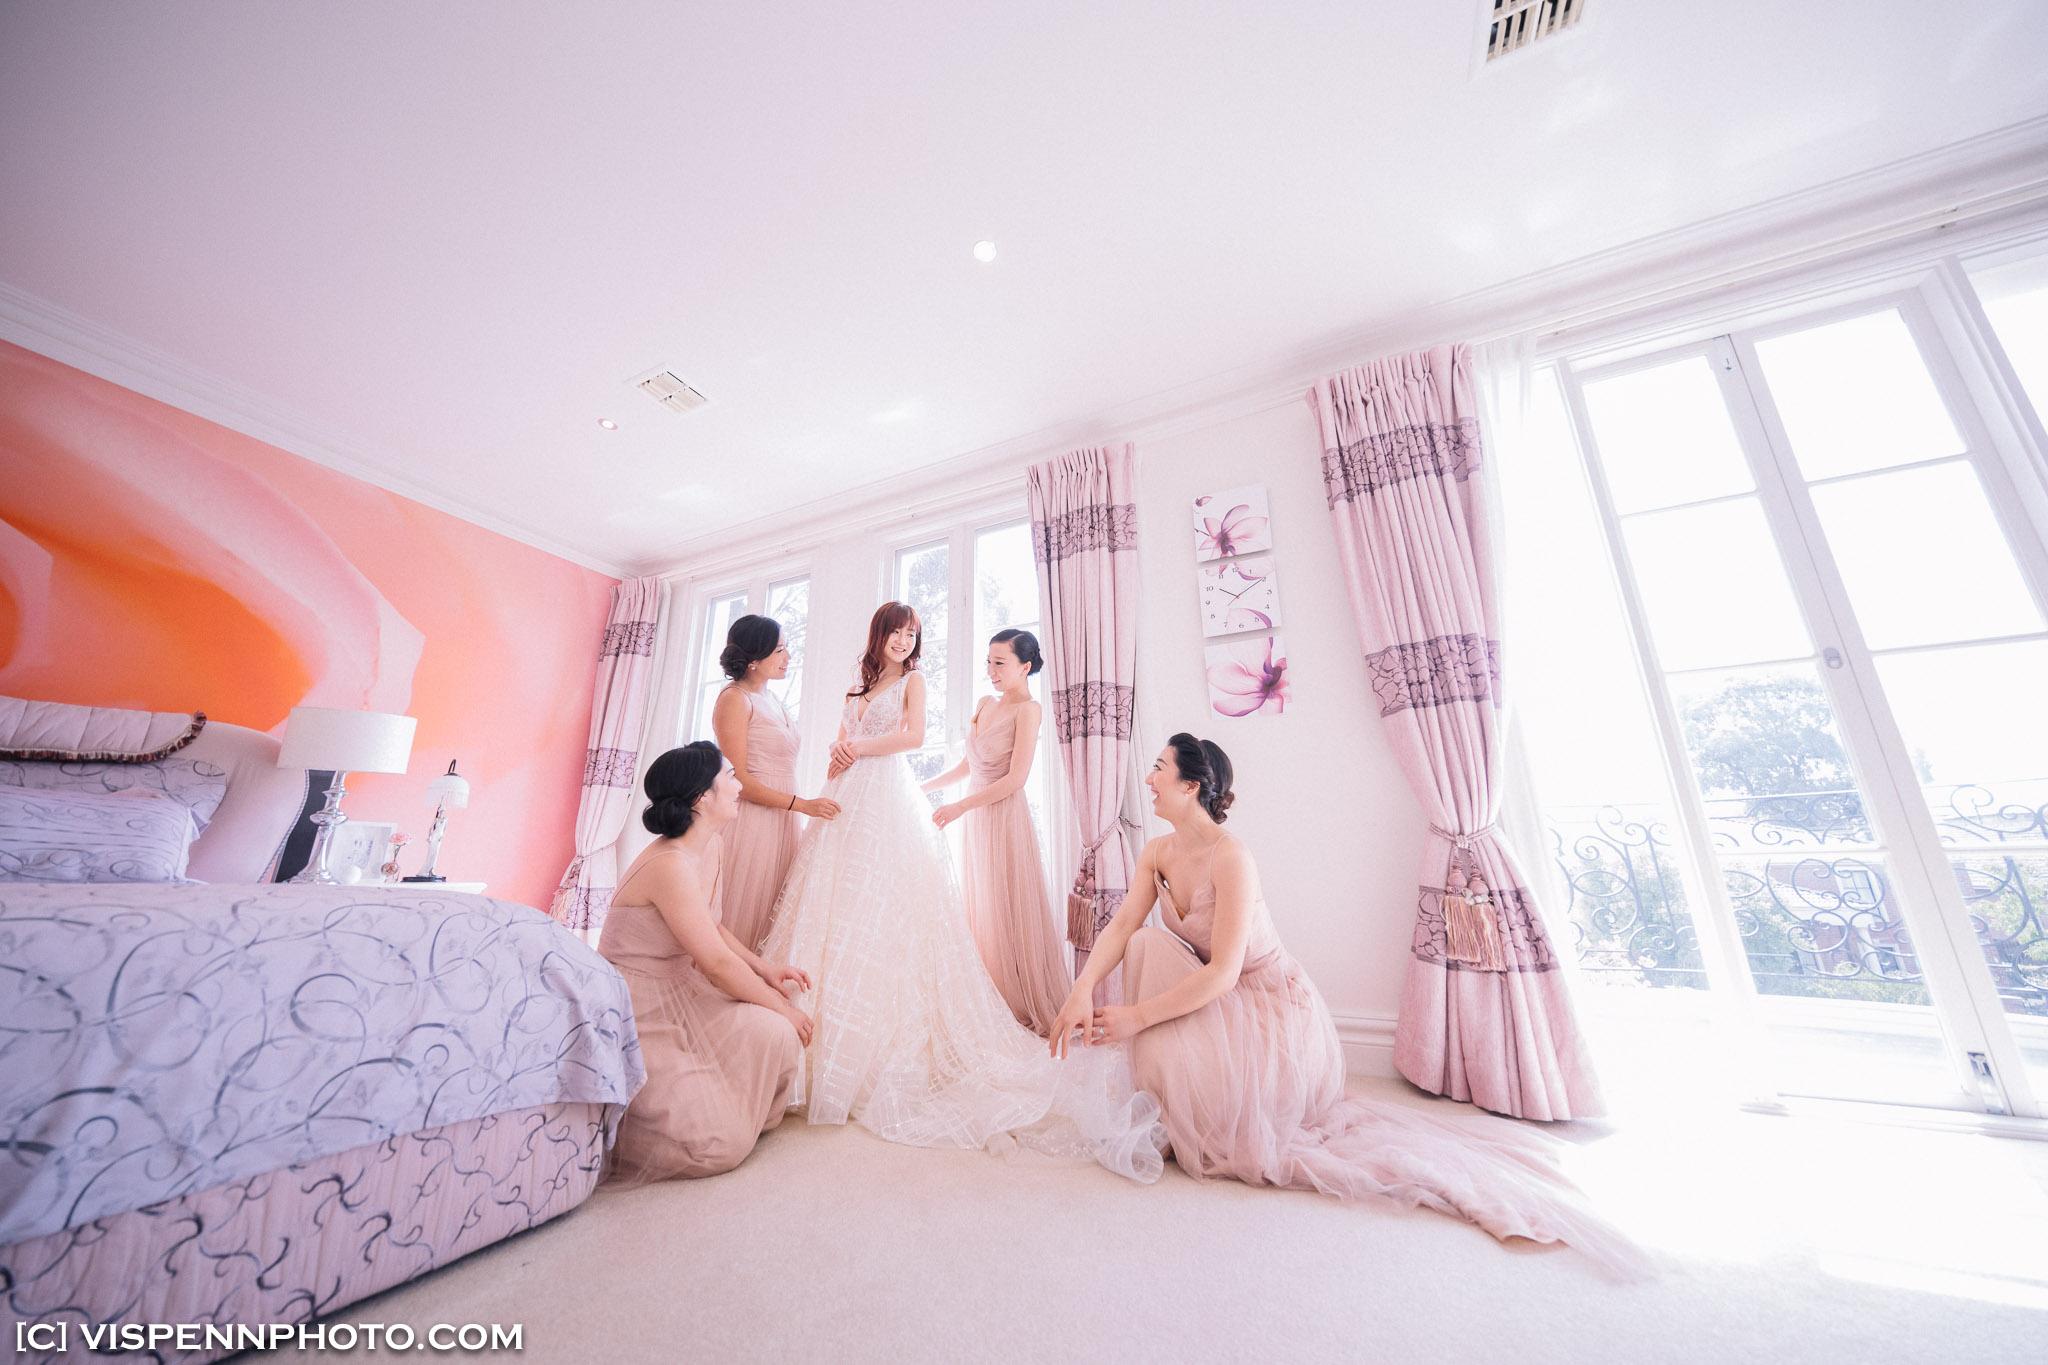 WEDDING DAY Photography Melbourne ZHPENN 0042 5D4 1390